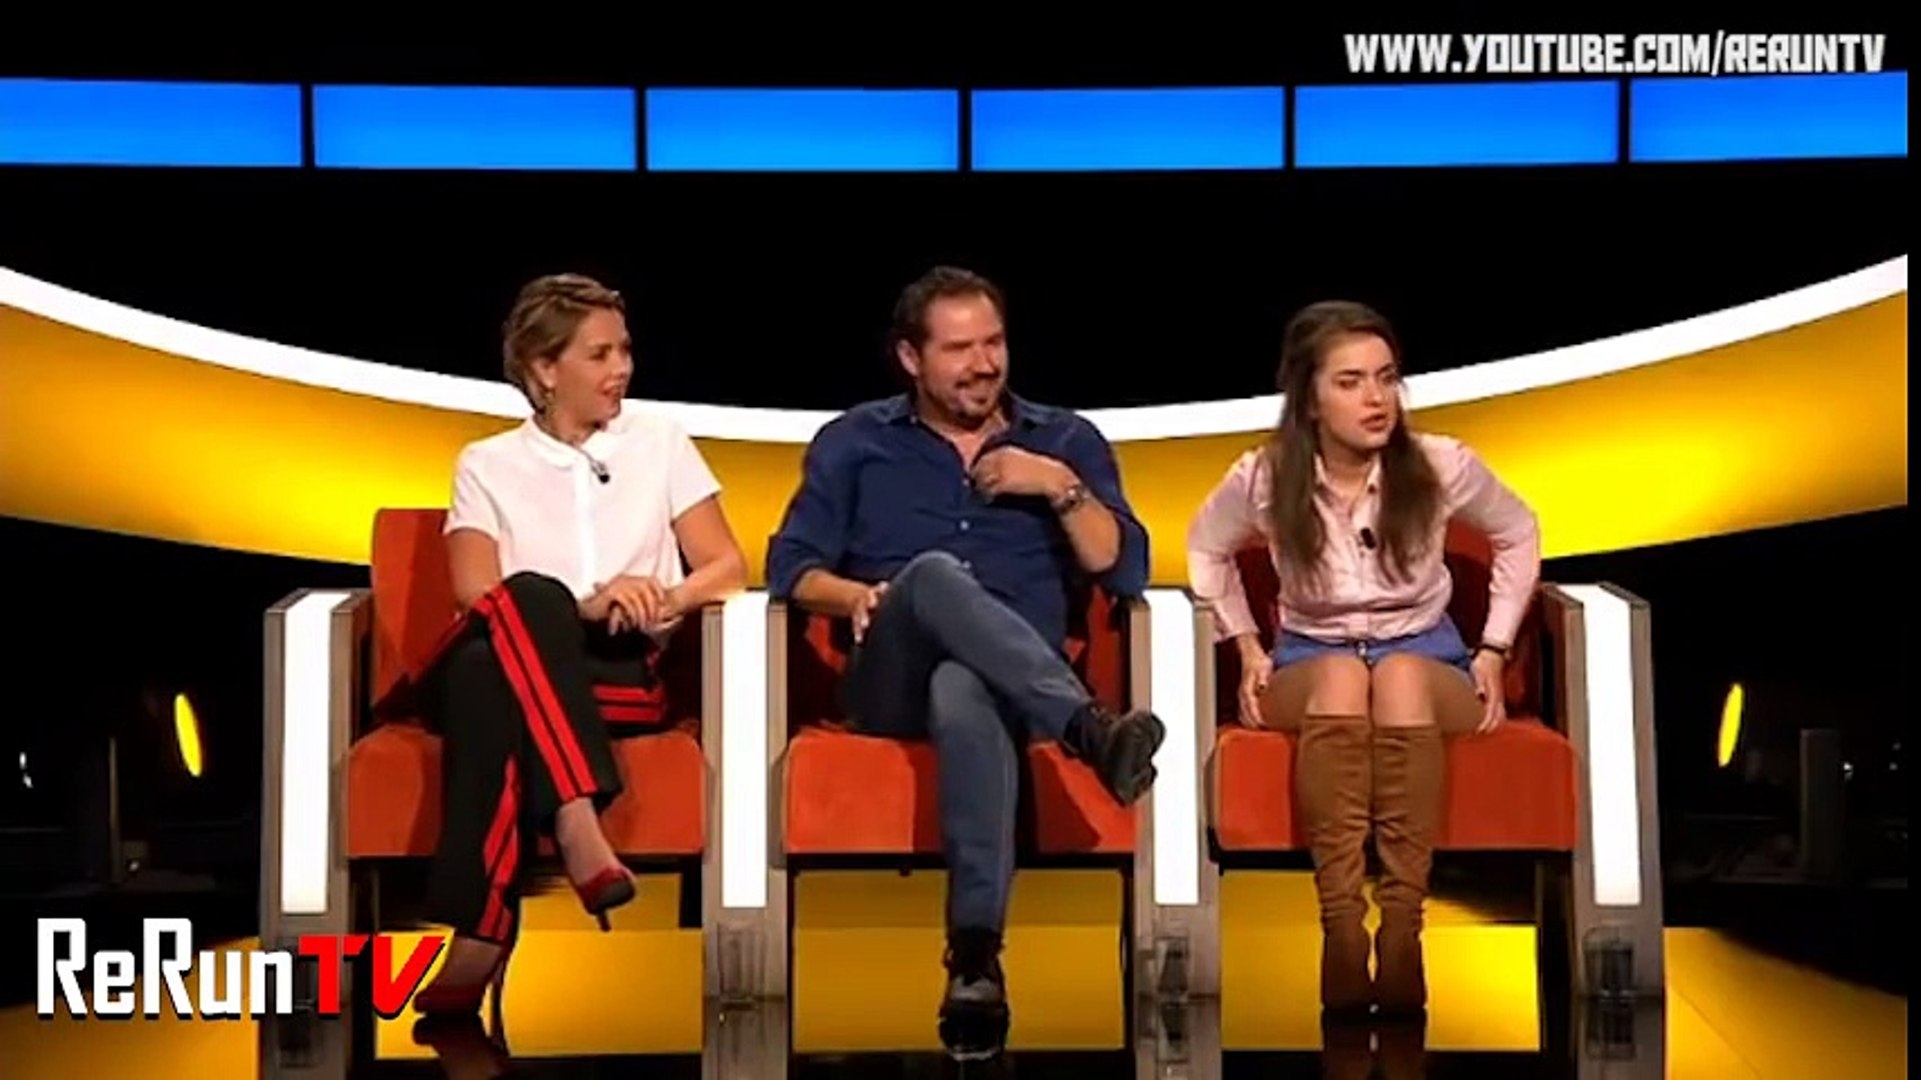 De Slimste Mens Ter Wereld De Leukste Fragmenten Van Olga Leyers Video Dailymotion